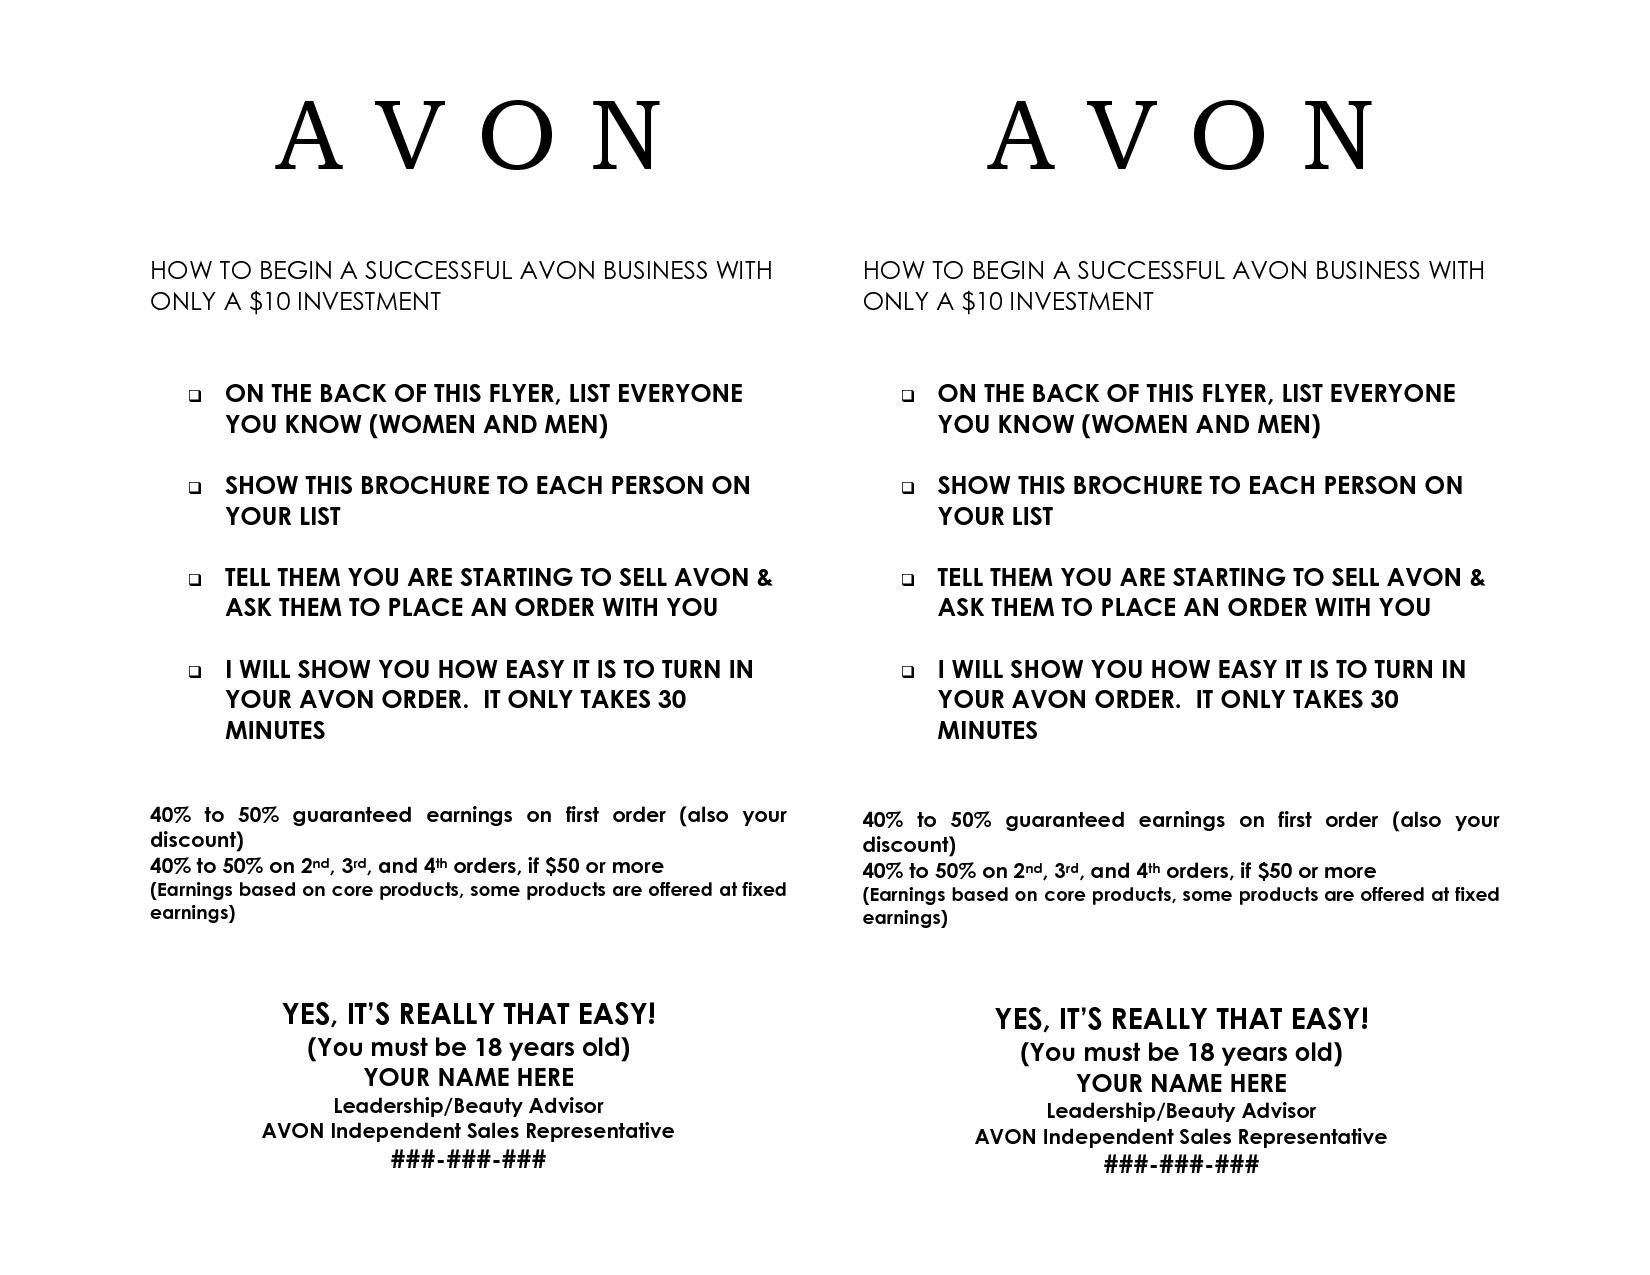 Avon Flyers | Avon Business | Avon | Pinterest | Avon, Avon - Free Printable Avon Flyers